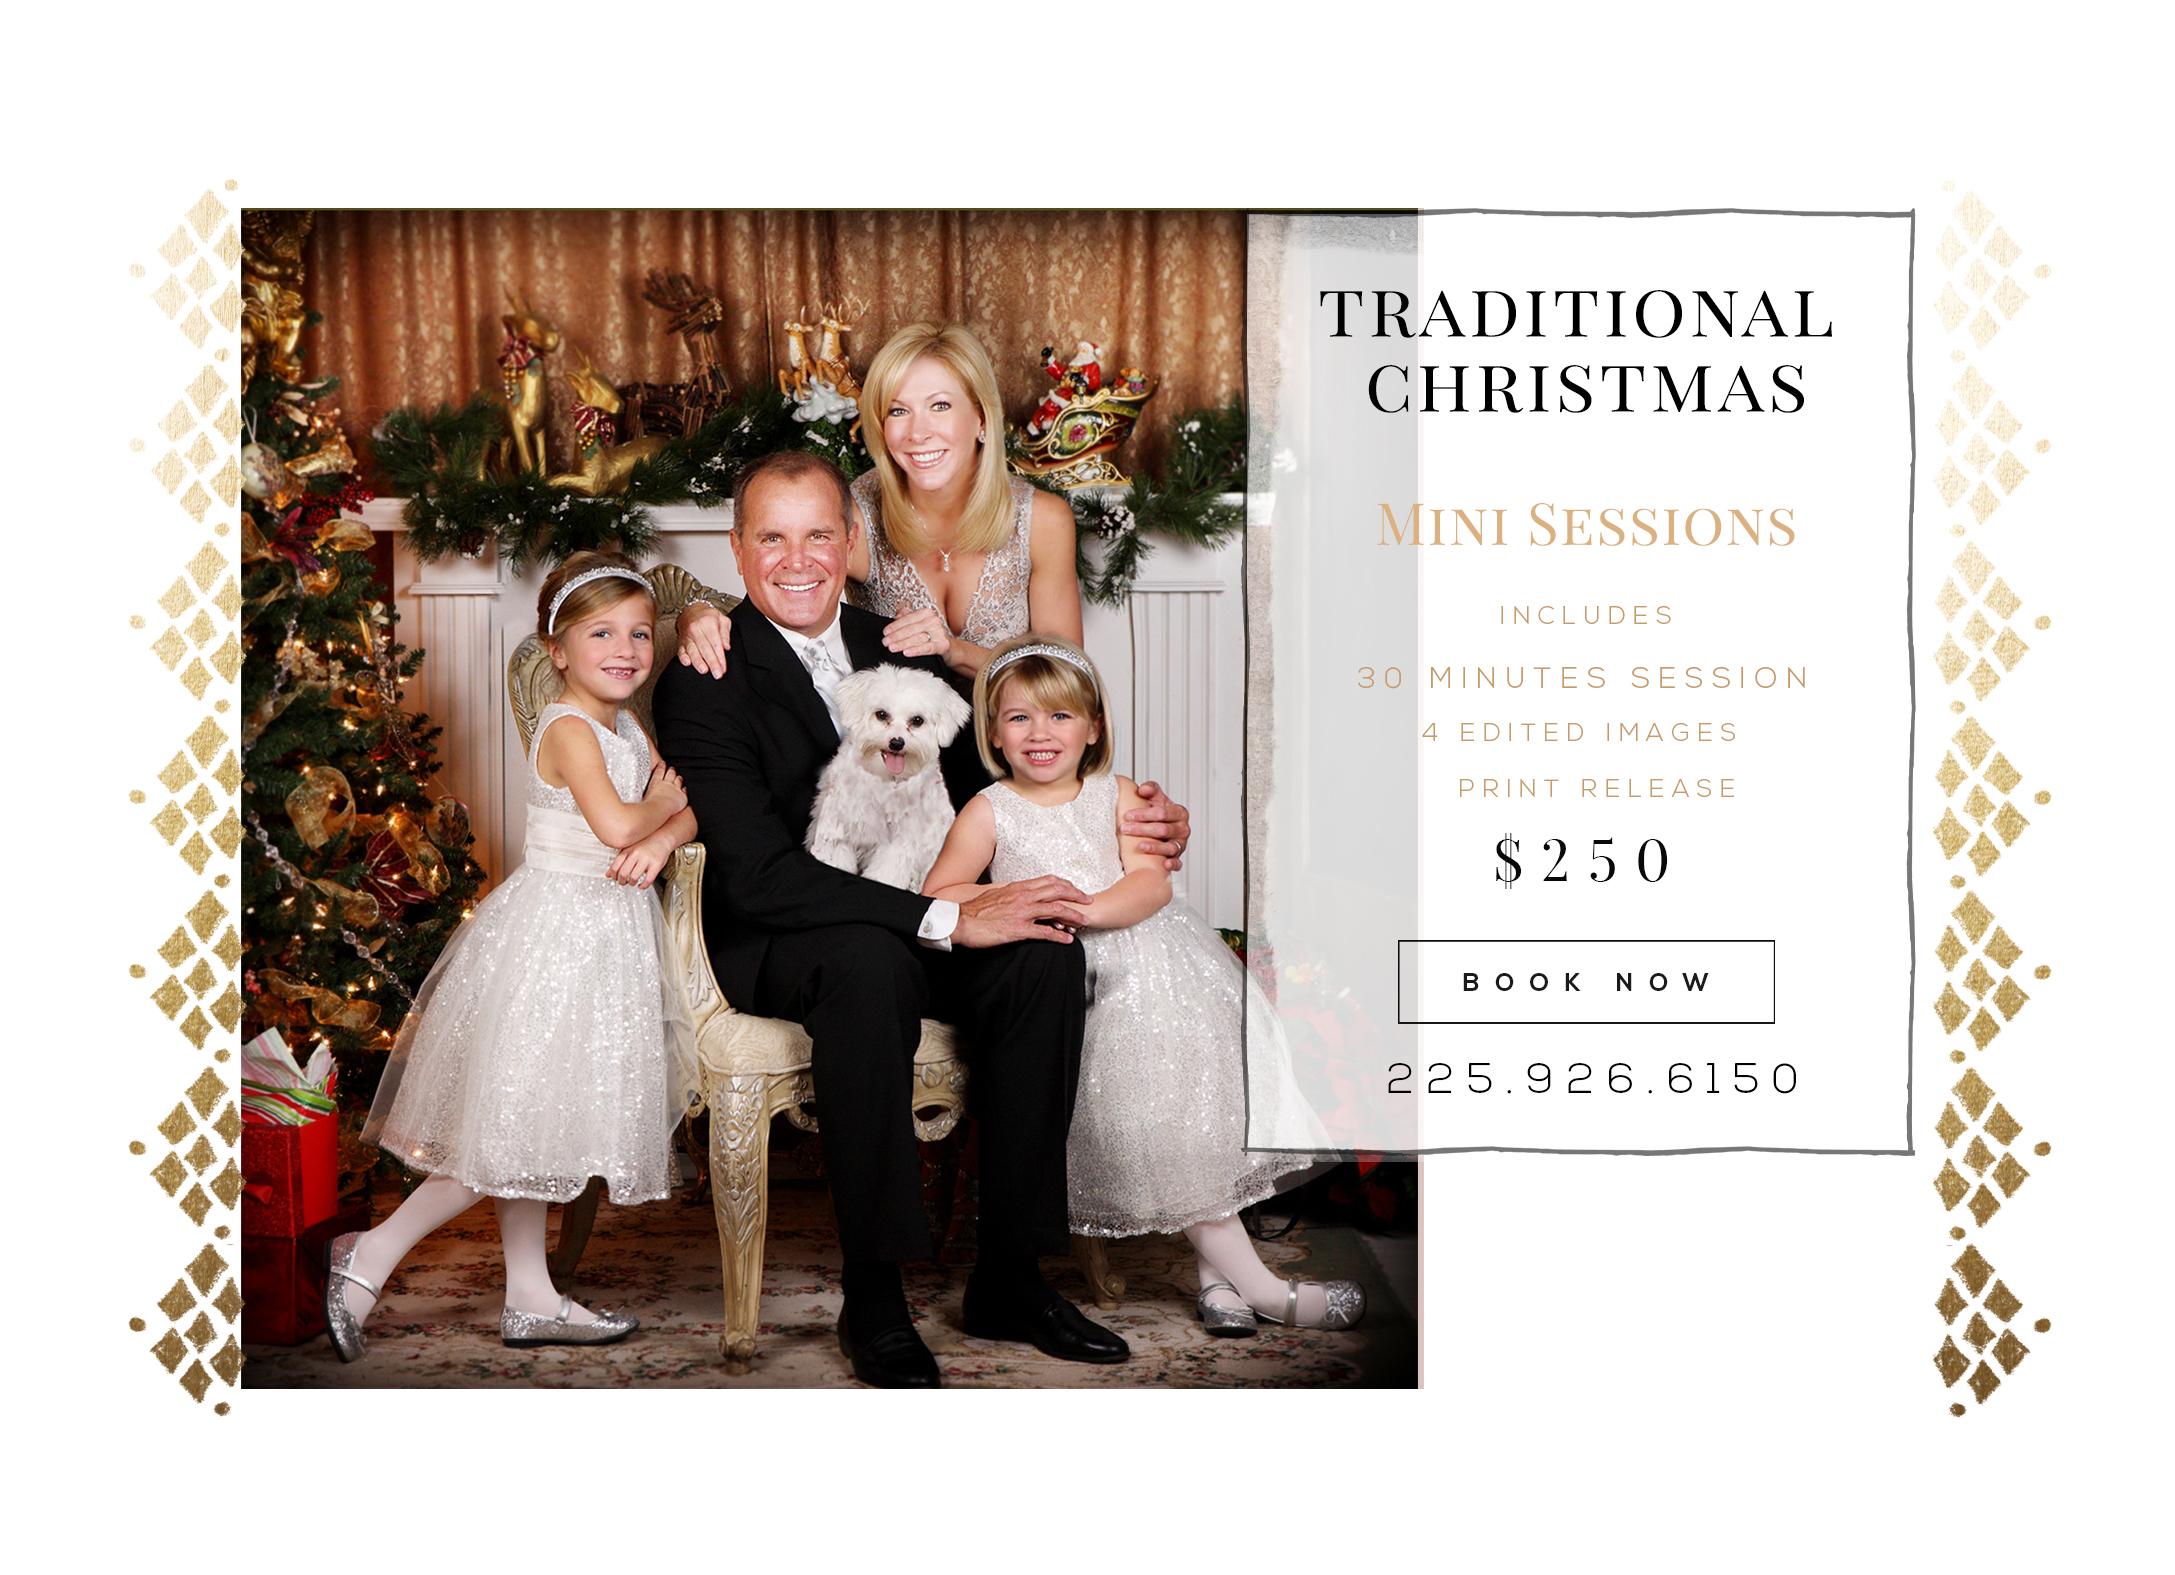 traditionalchristmas